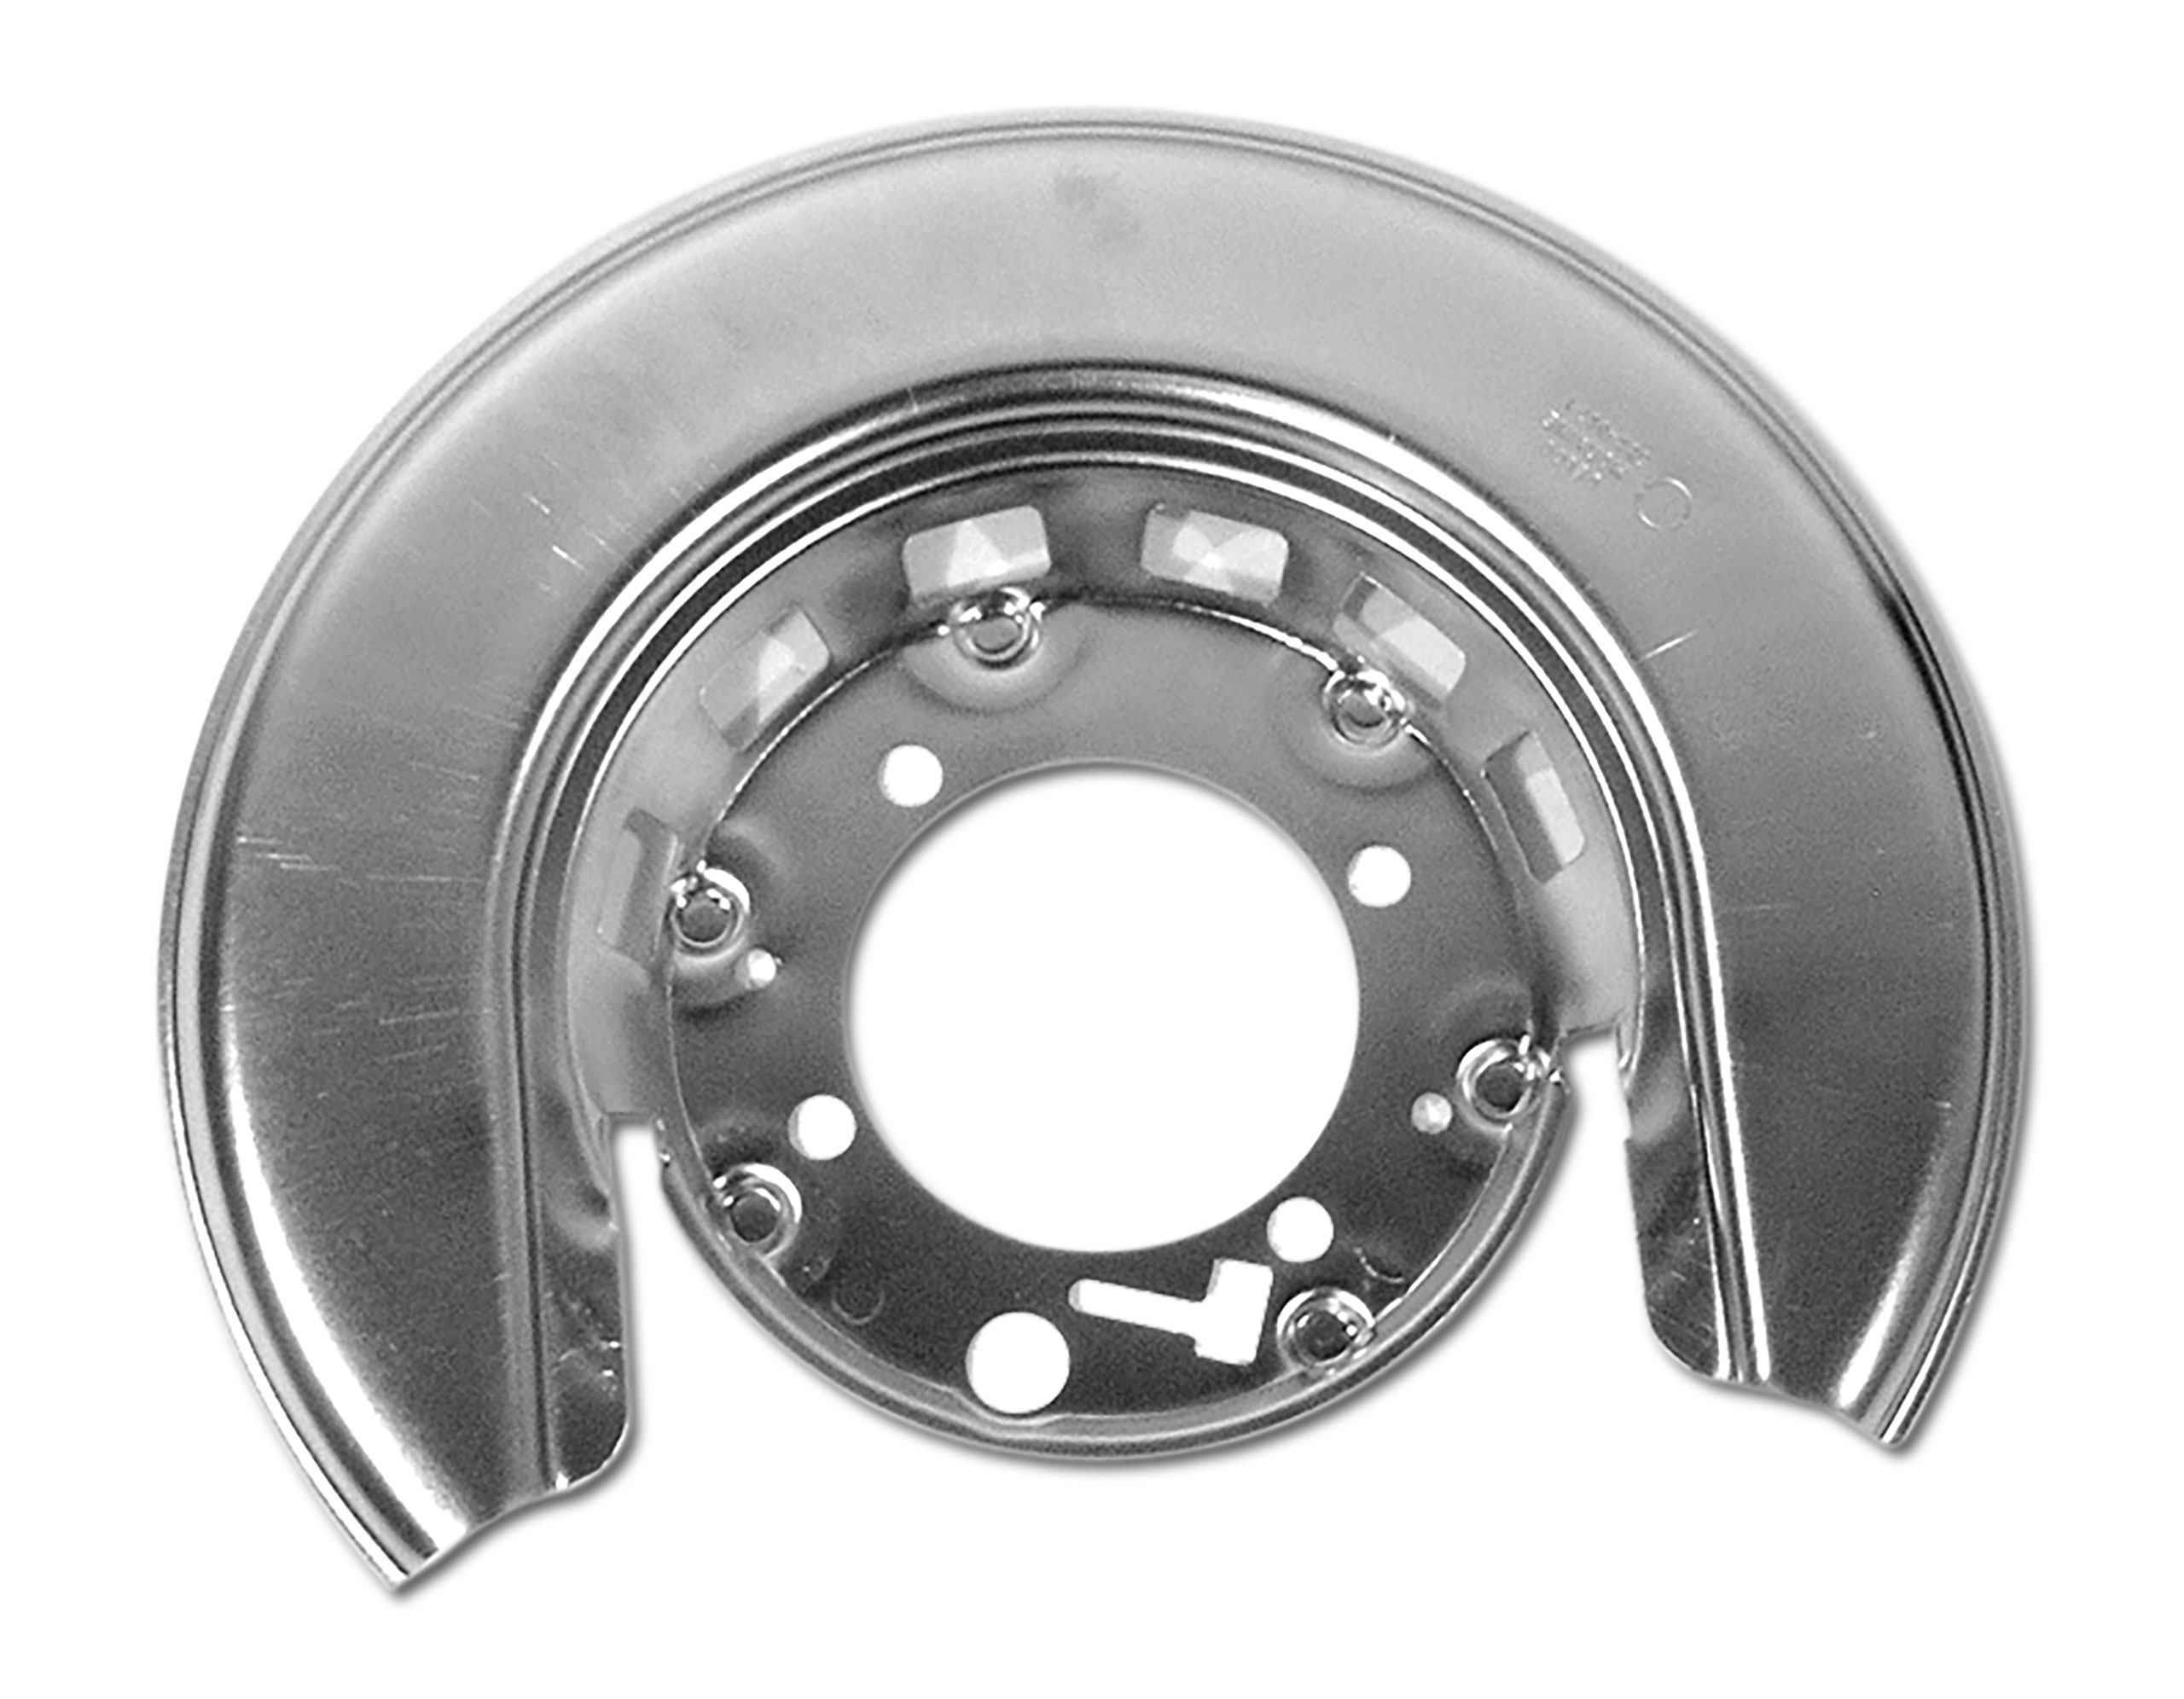 Auto Accessories of America 1965-1975 Chevrolet Corvette Rear Backing Shield. Silver LH - Reproduction